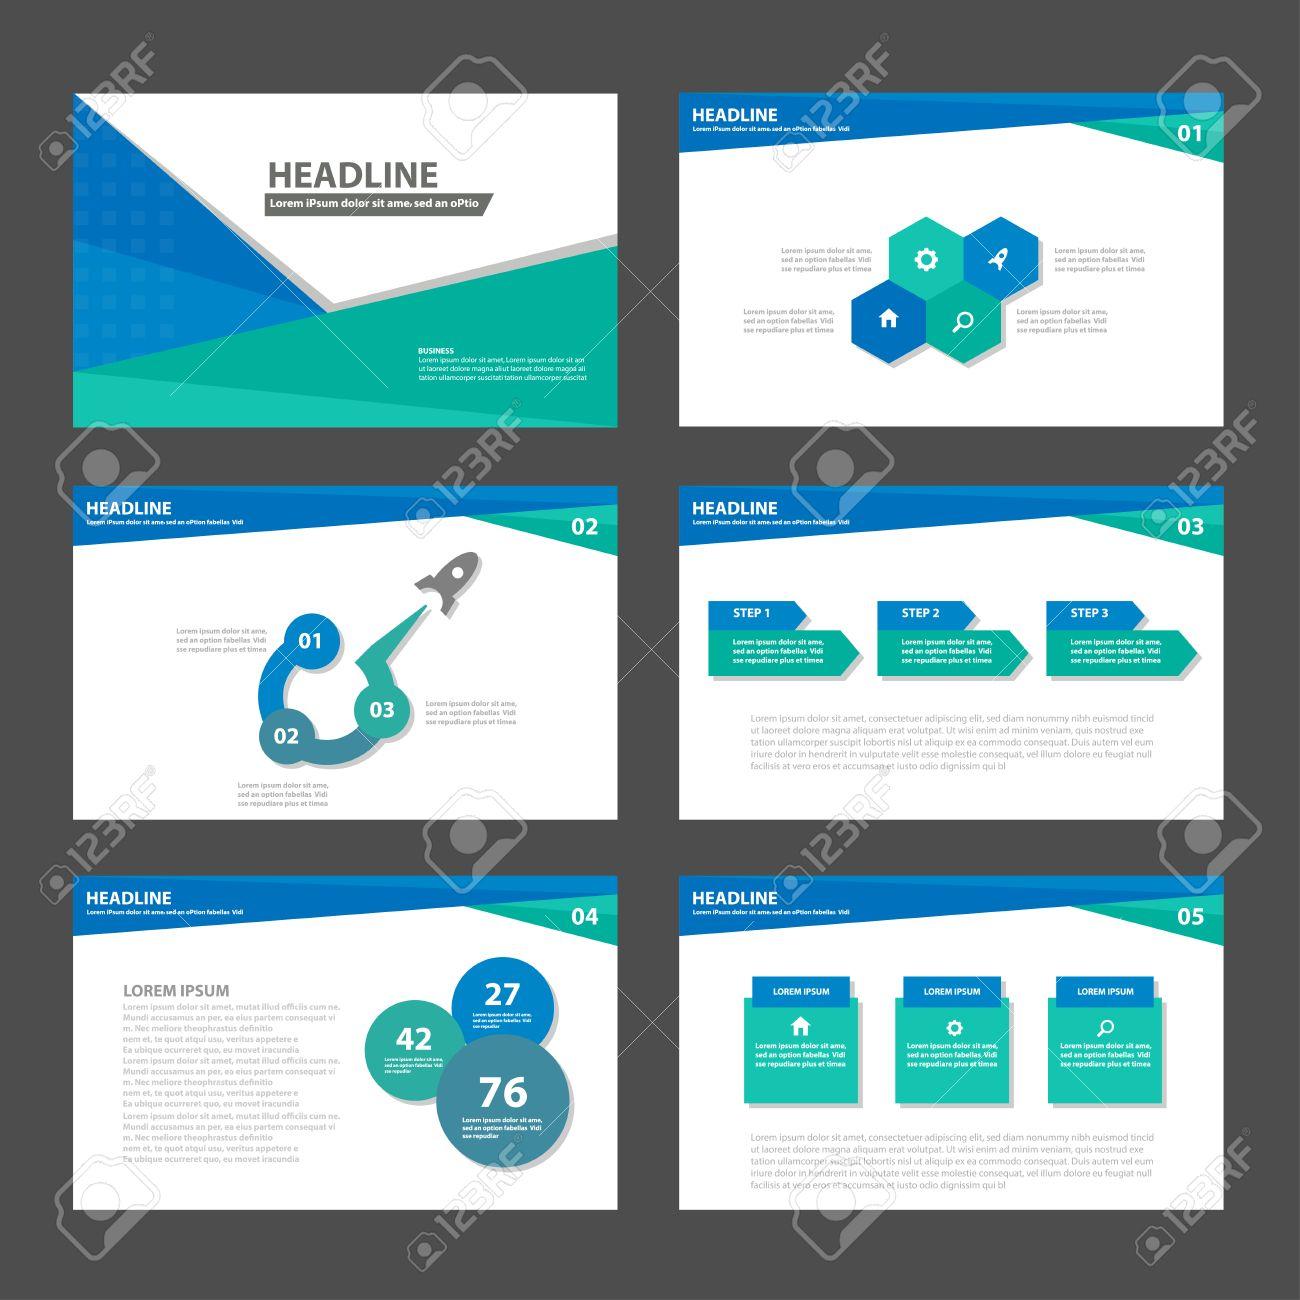 blue green business multipurpose infographic elements and icon blue green business multipurpose infographic elements and icon presentation template flat design set for advertising marketing